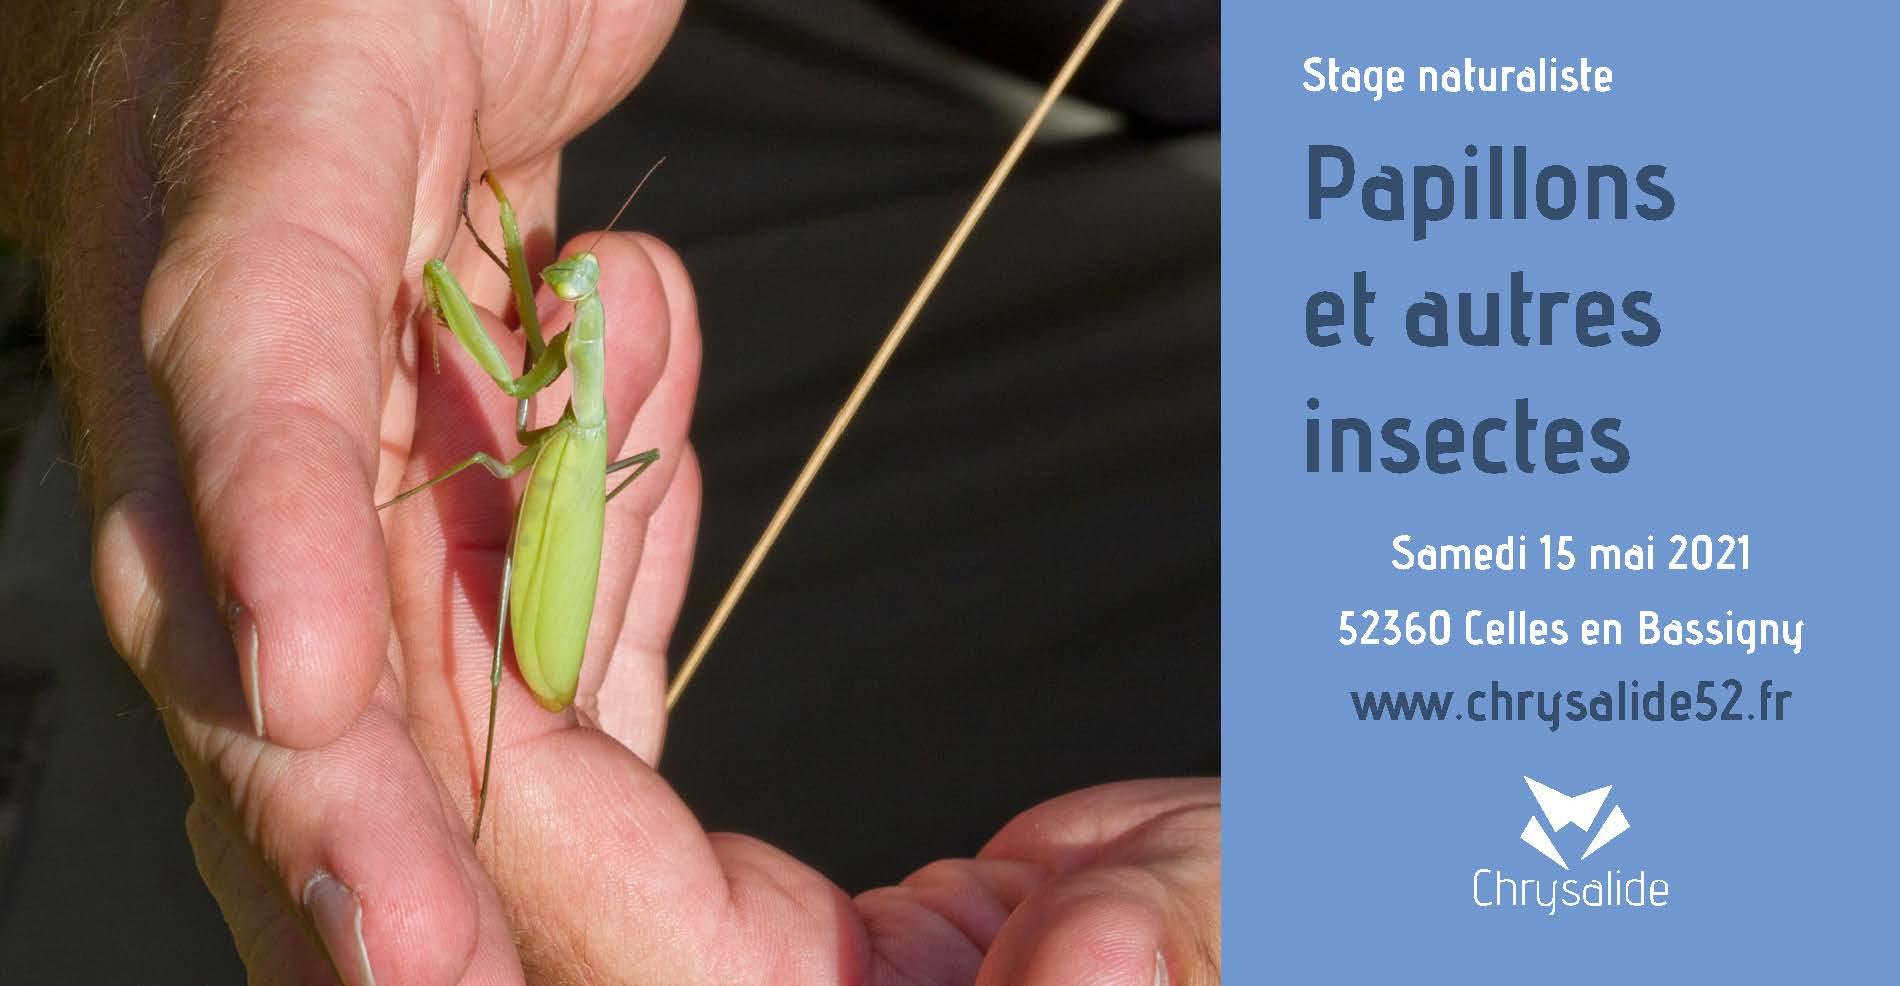 Stage naturaliste - Papillons et autres insectes - Chrysalide52 - Michael Geber - Haute-Marne